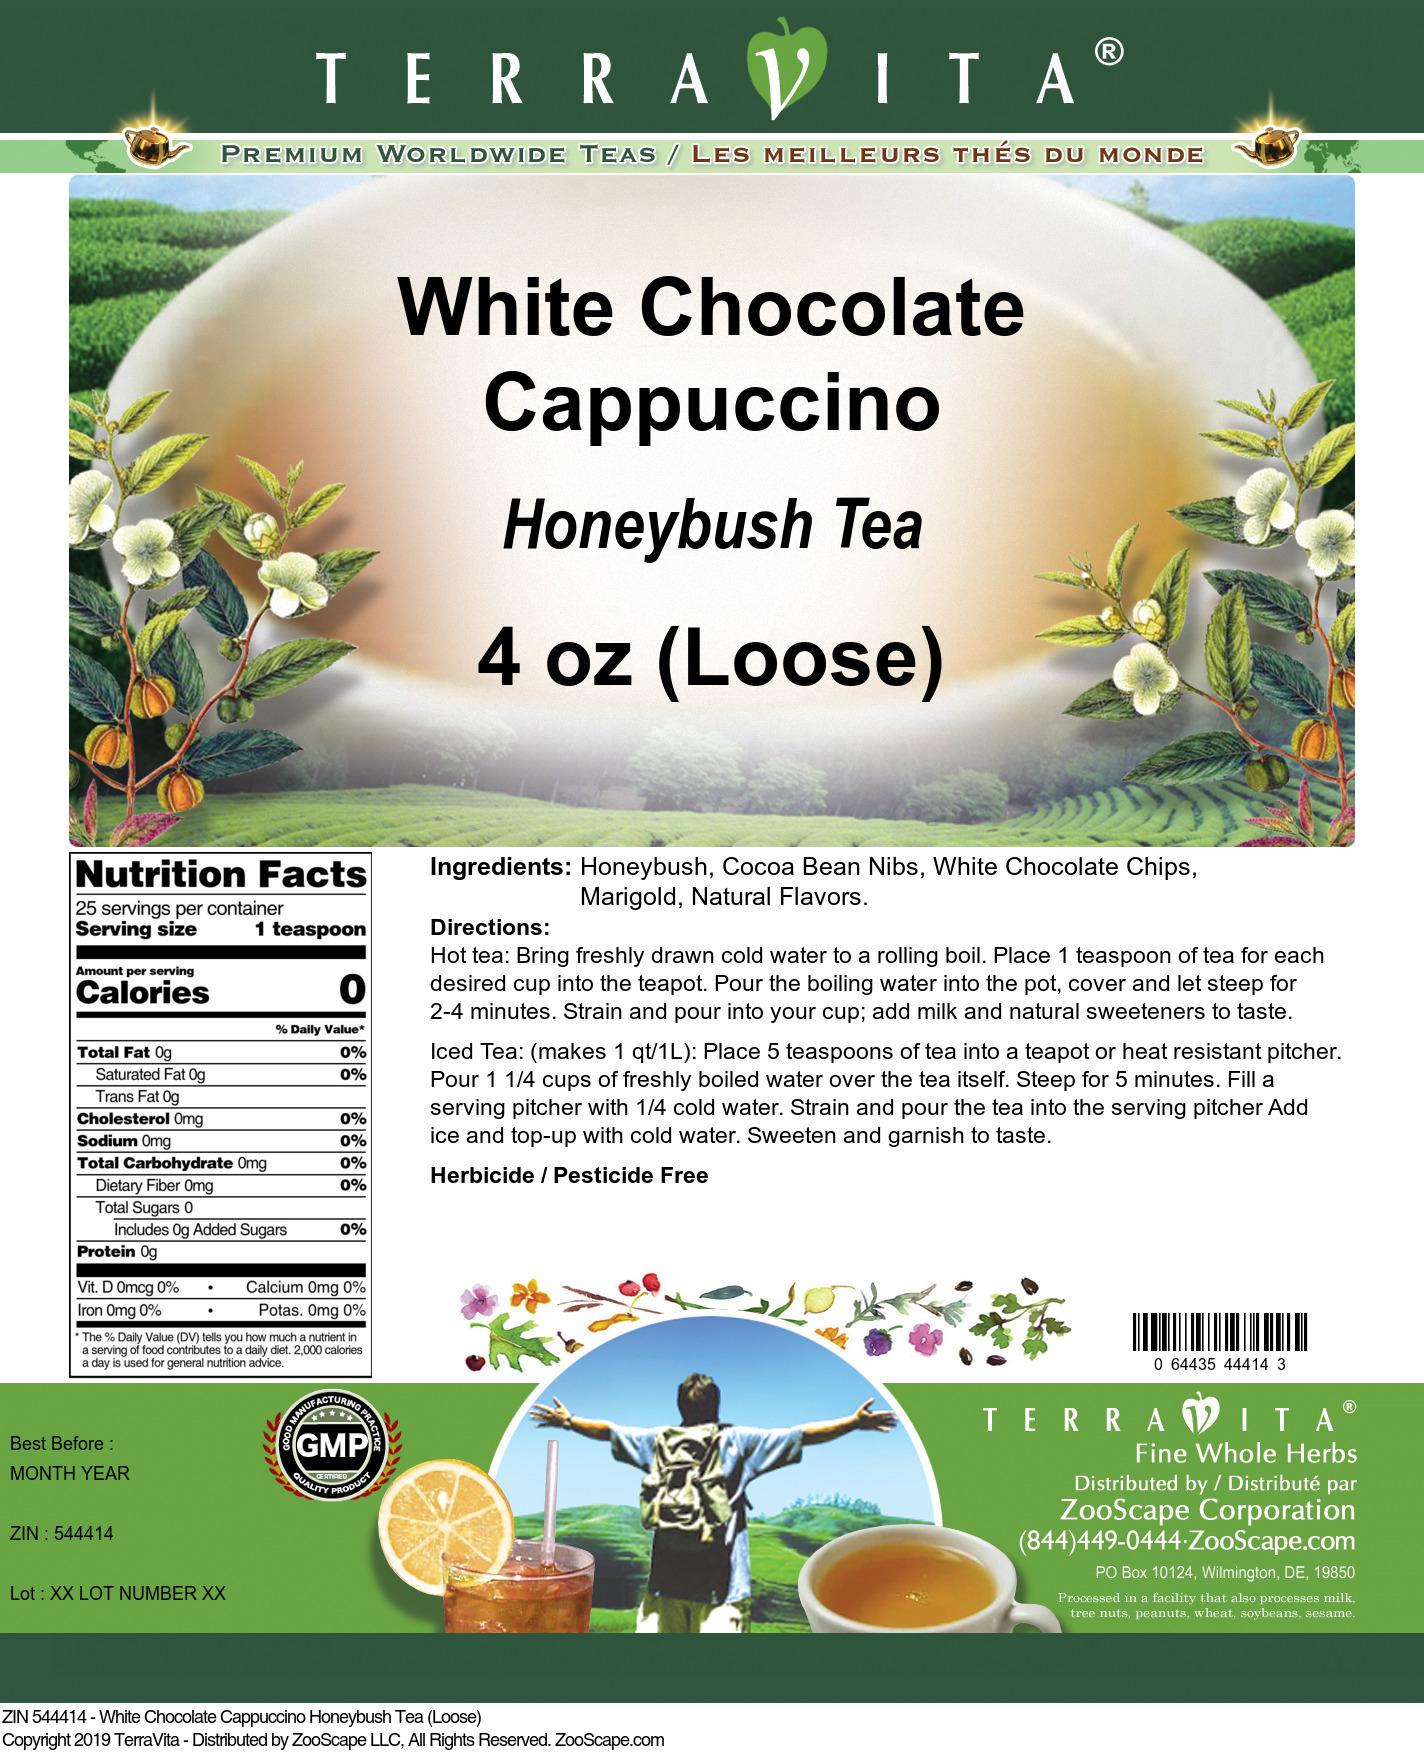 White Chocolate Cappuccino Honeybush Tea (Loose)